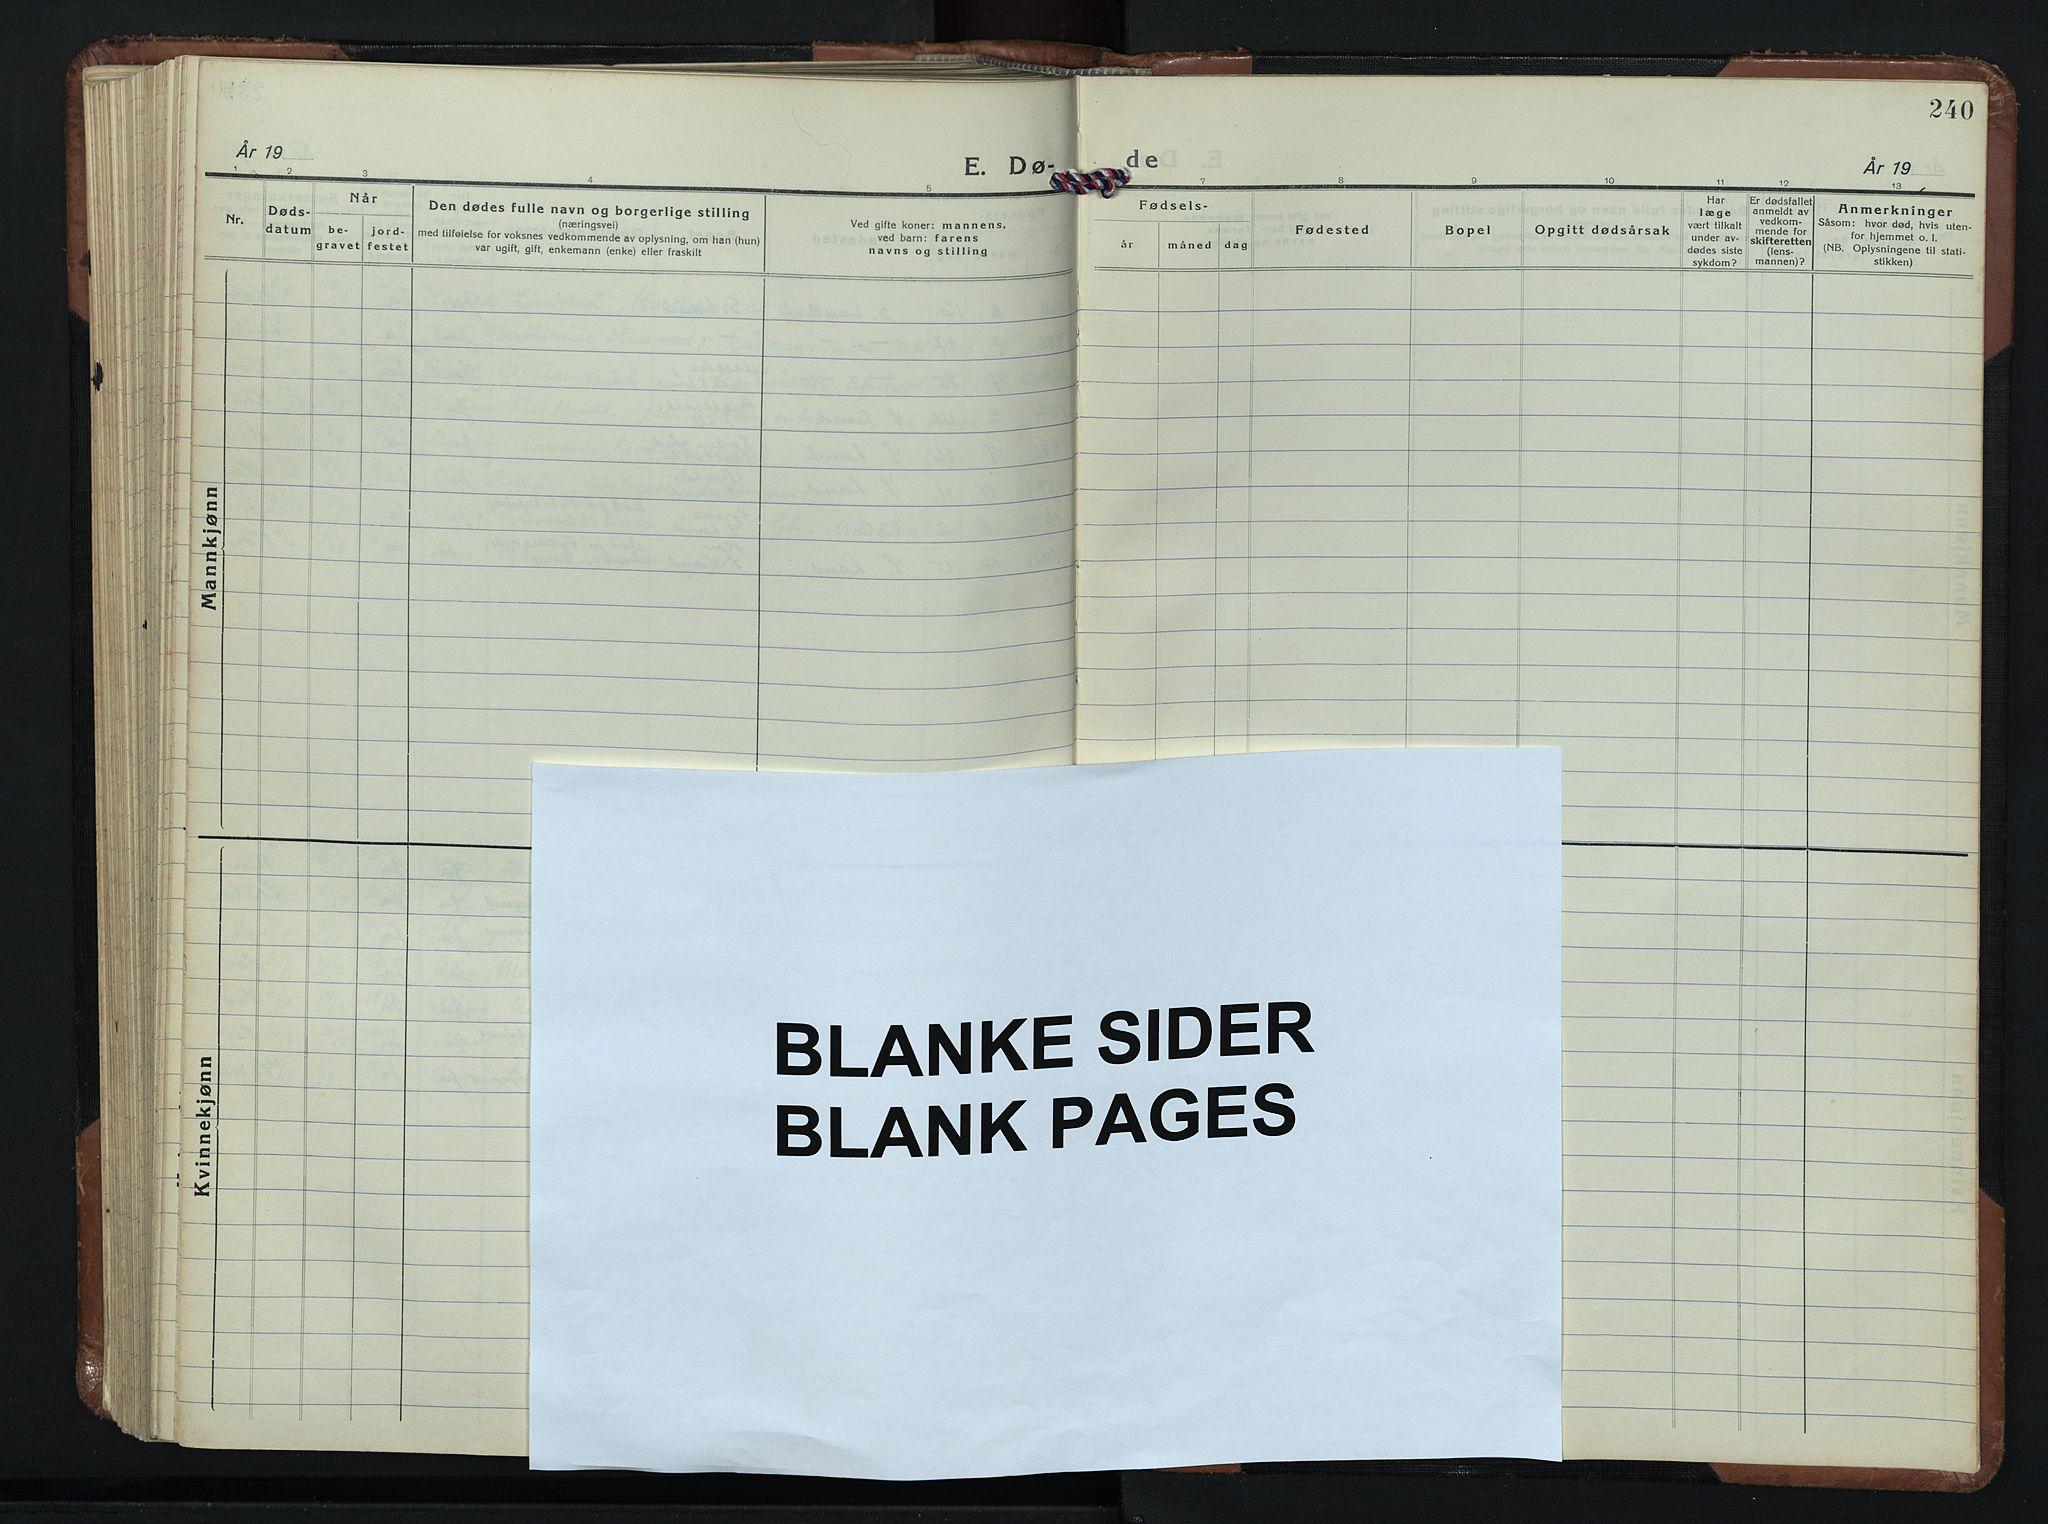 SAH, Søndre Land prestekontor, L/L0009: Klokkerbok nr. 9, 1933-1954, s. 240